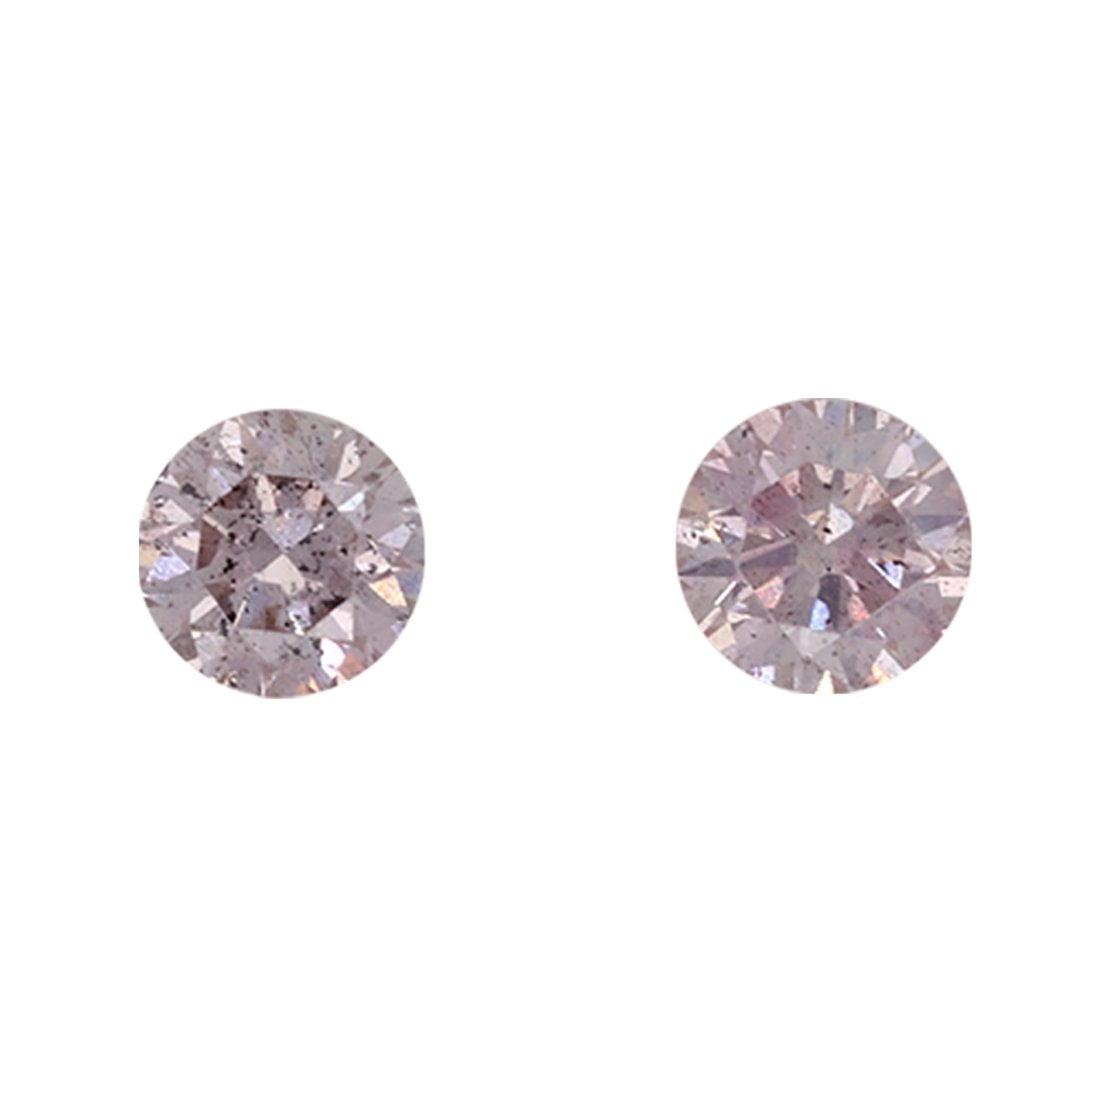 2=0.39ct Natural Fancy Light Pink Orange, 8P Argyle Diamond